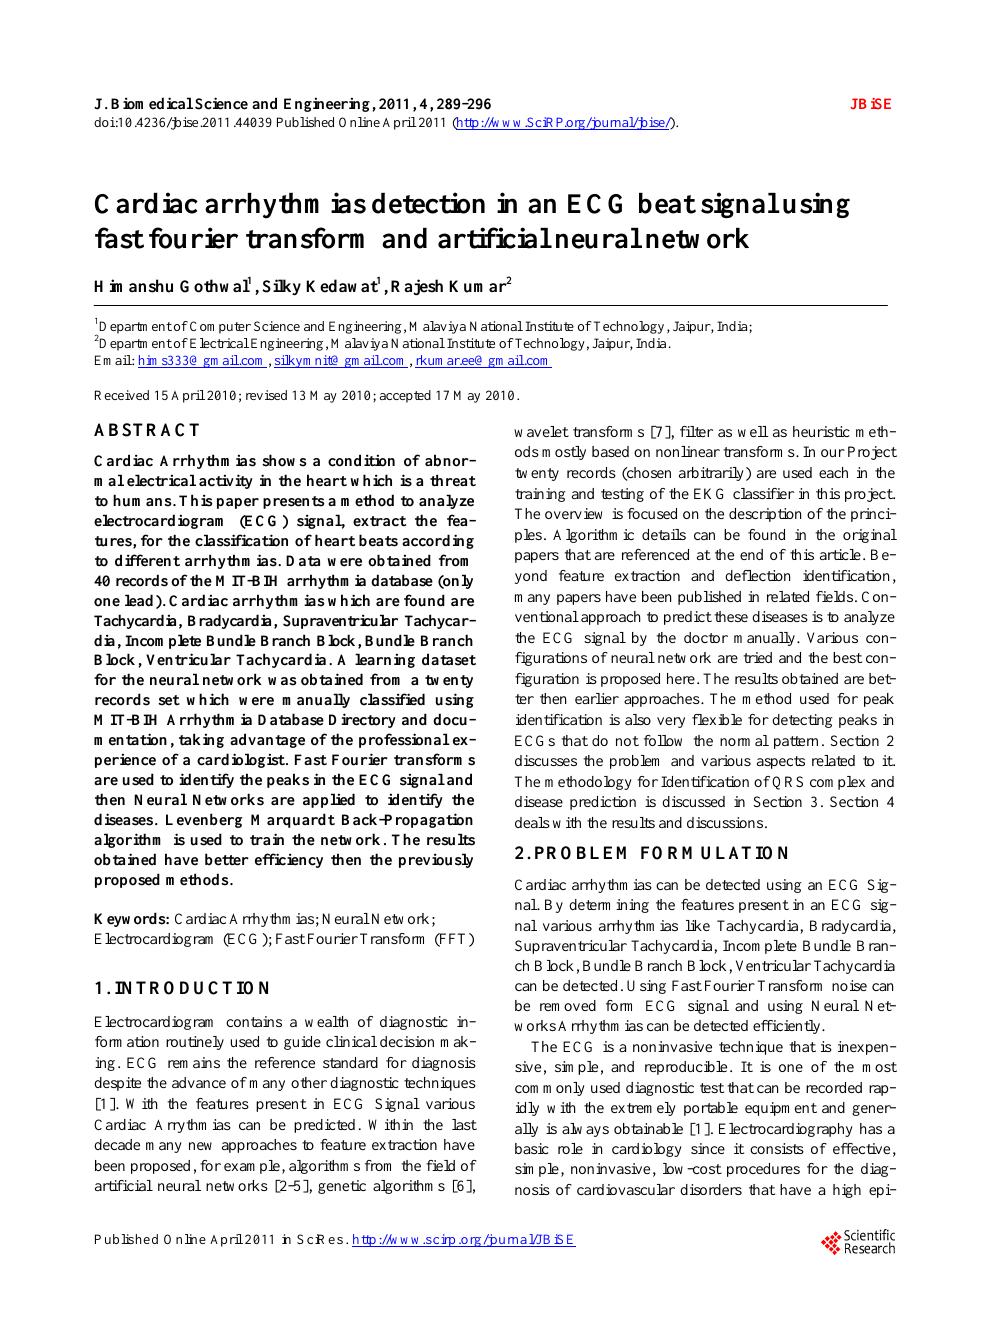 Cardiac arrhythmias detection in an ECG beat signal using fast